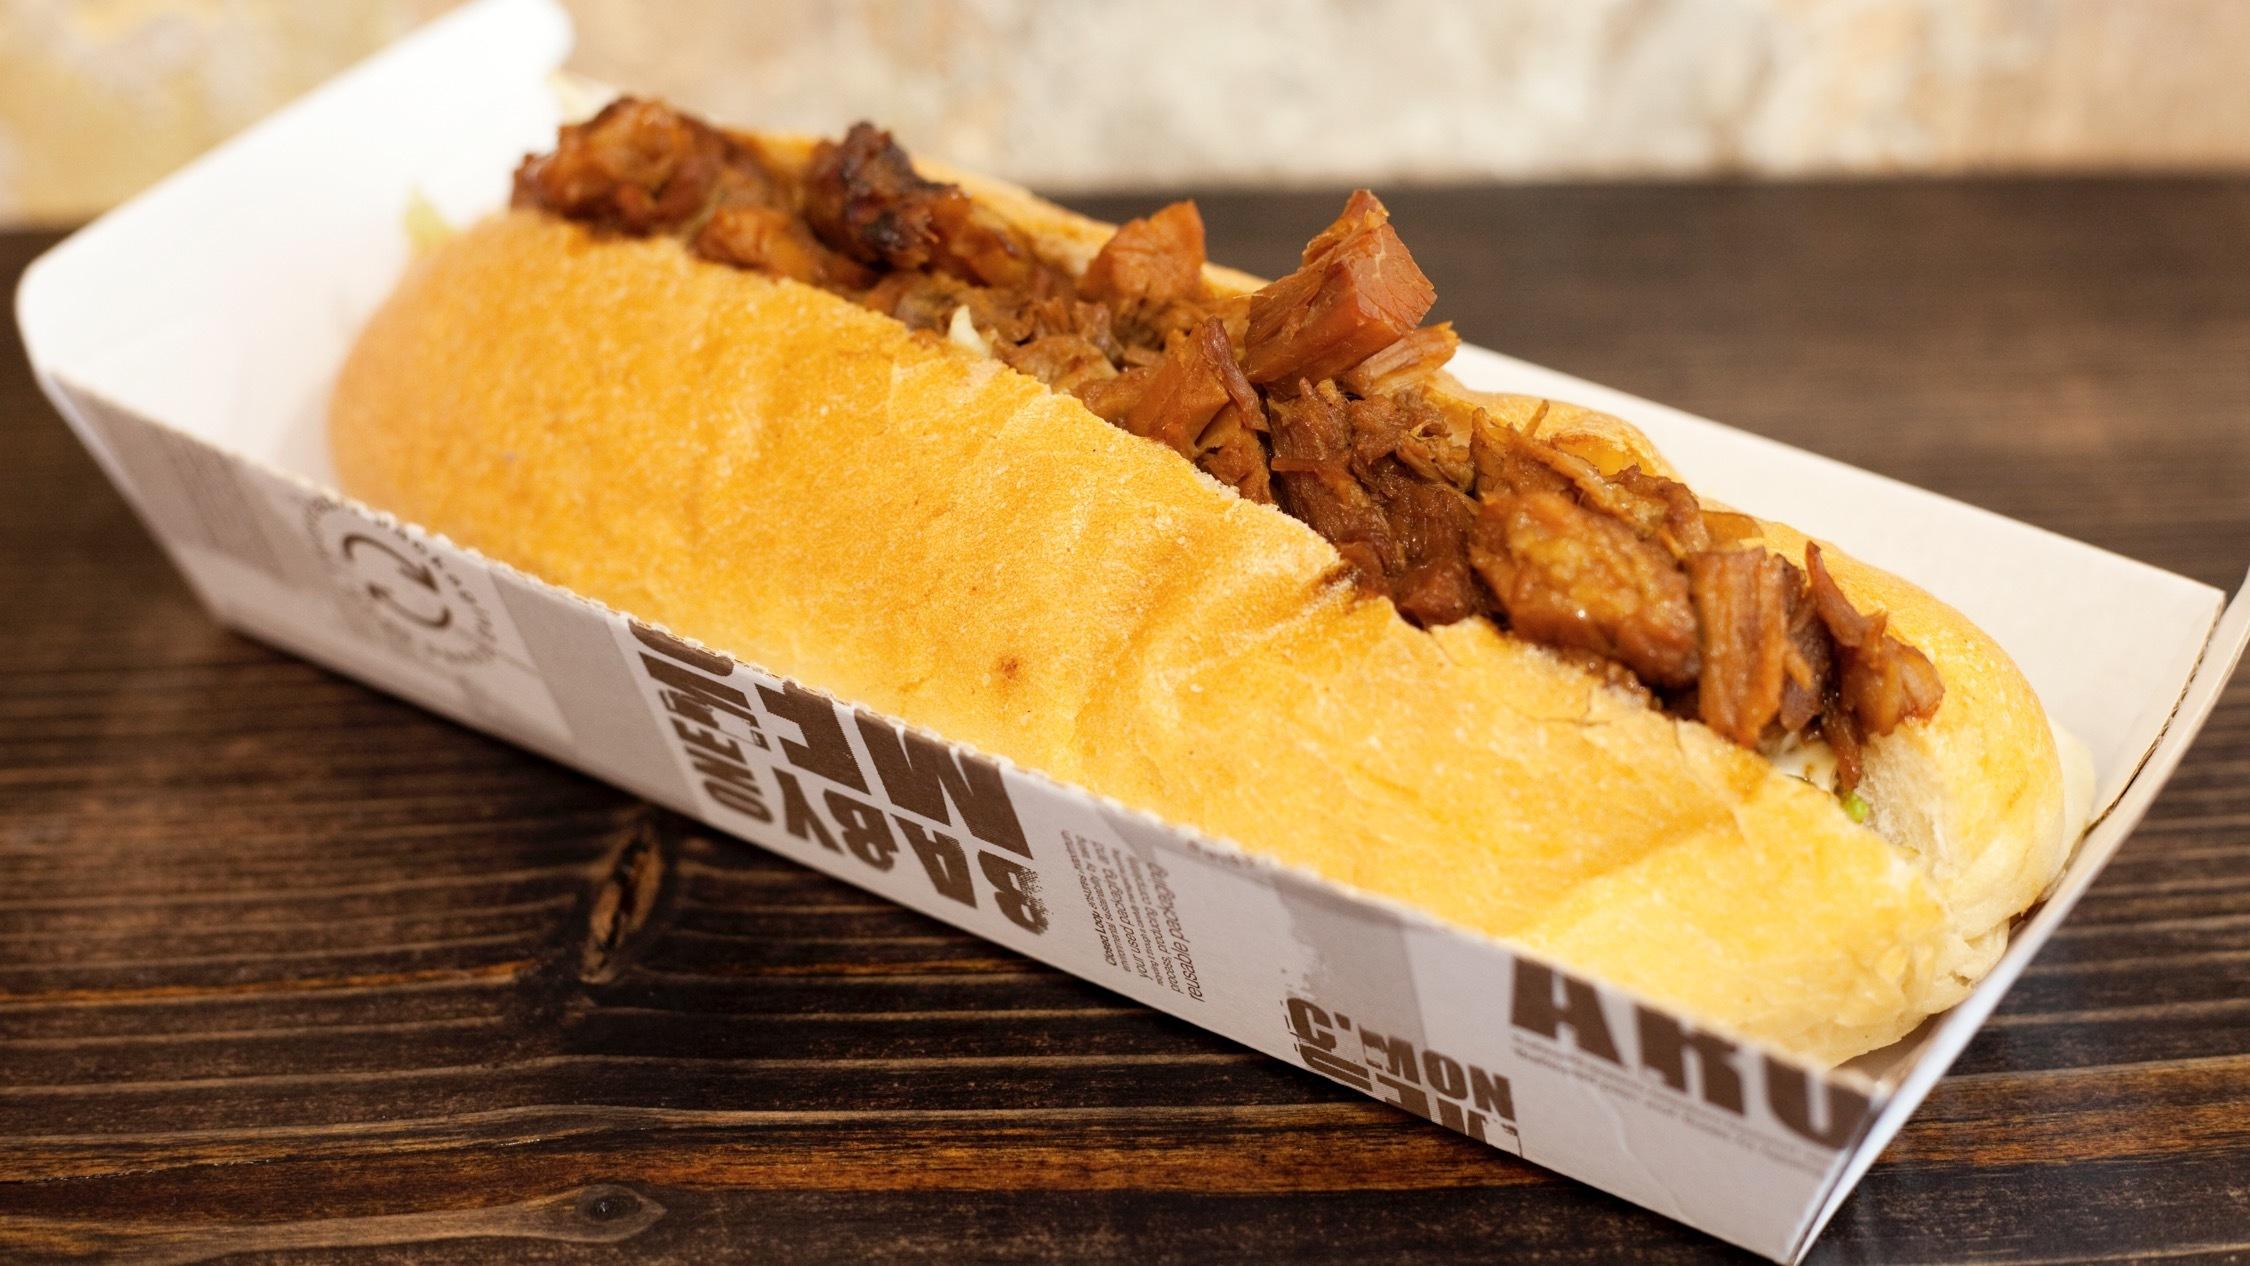 Crackles classic roast pork roll at Mr Crackles Carryout, $14.50